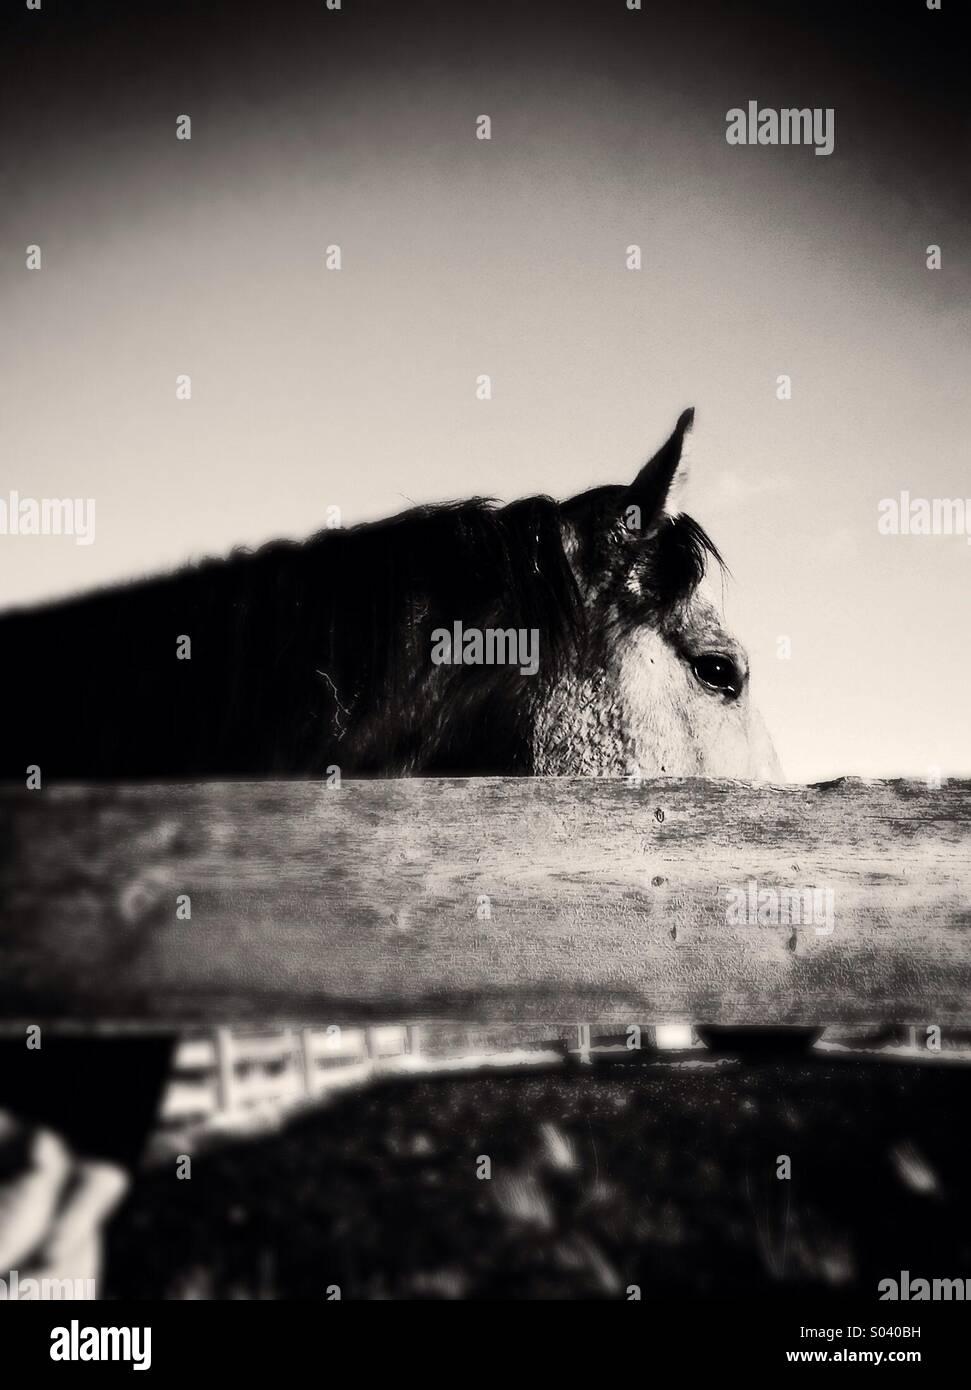 Wild West Horse - Stock Image